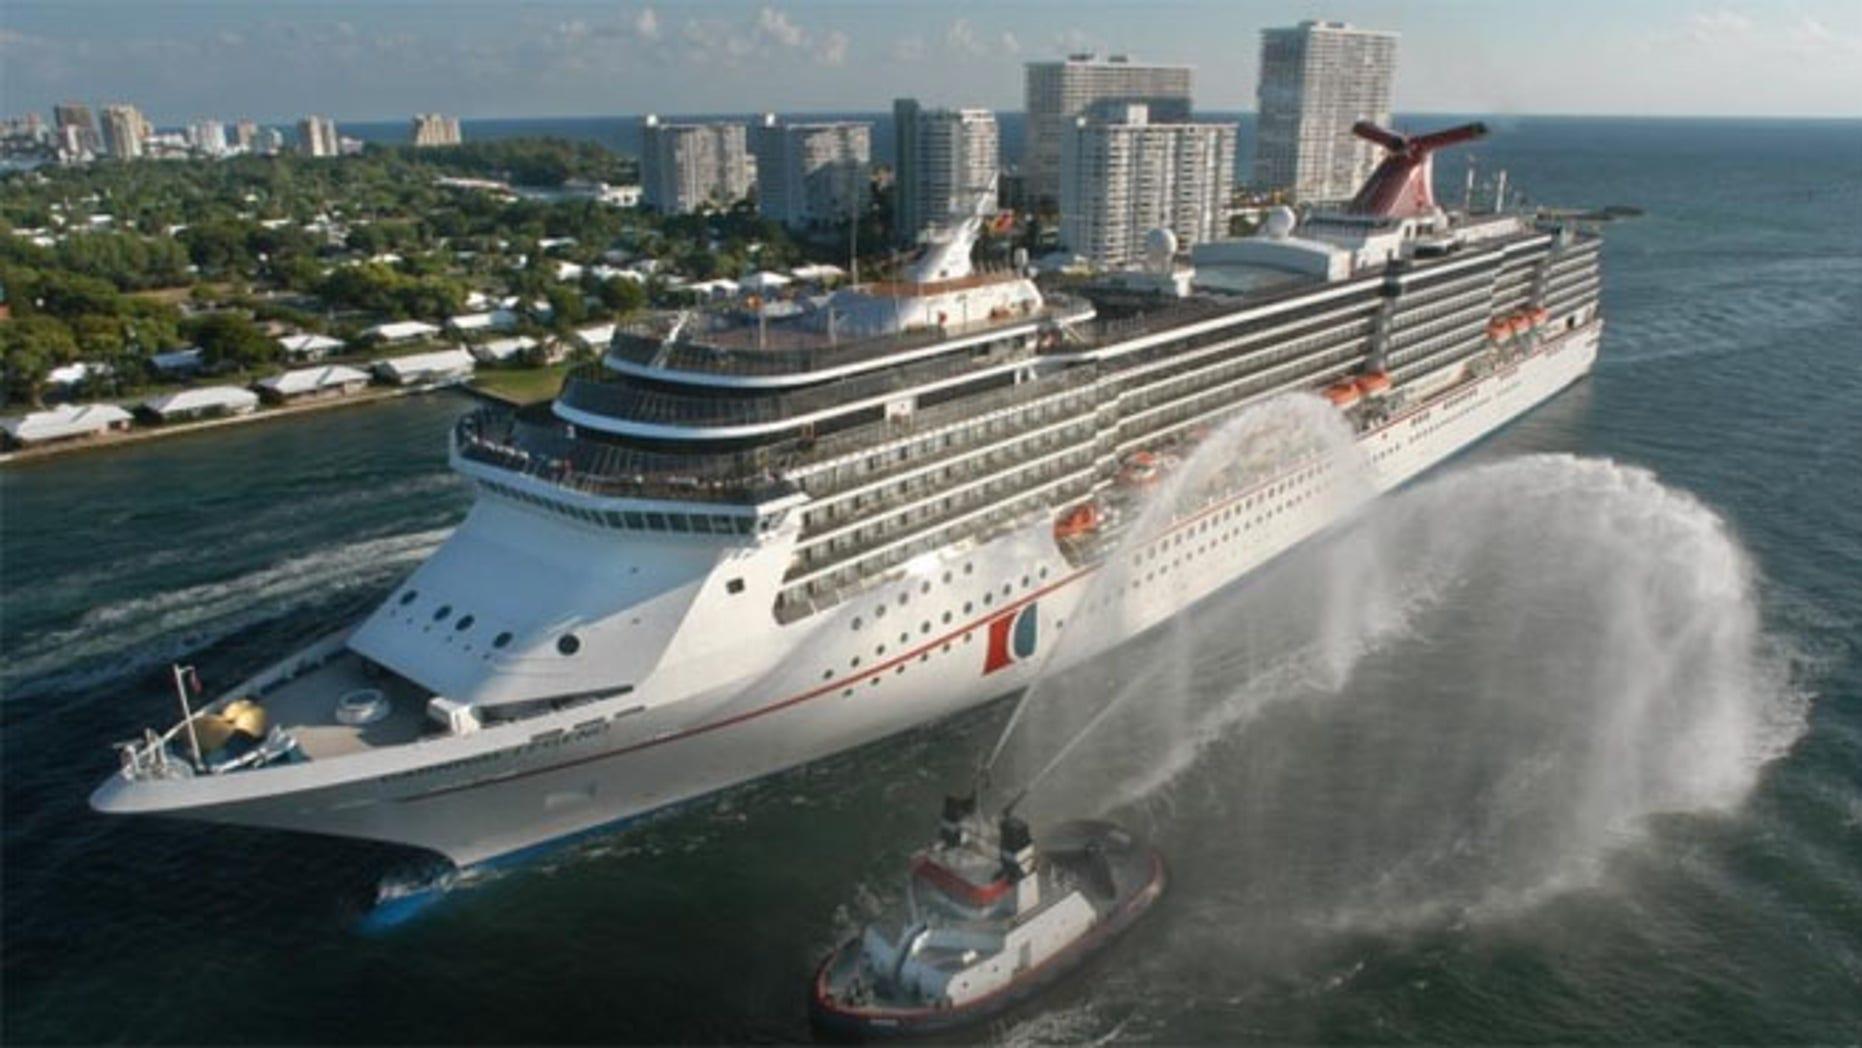 Cruise ship junkie